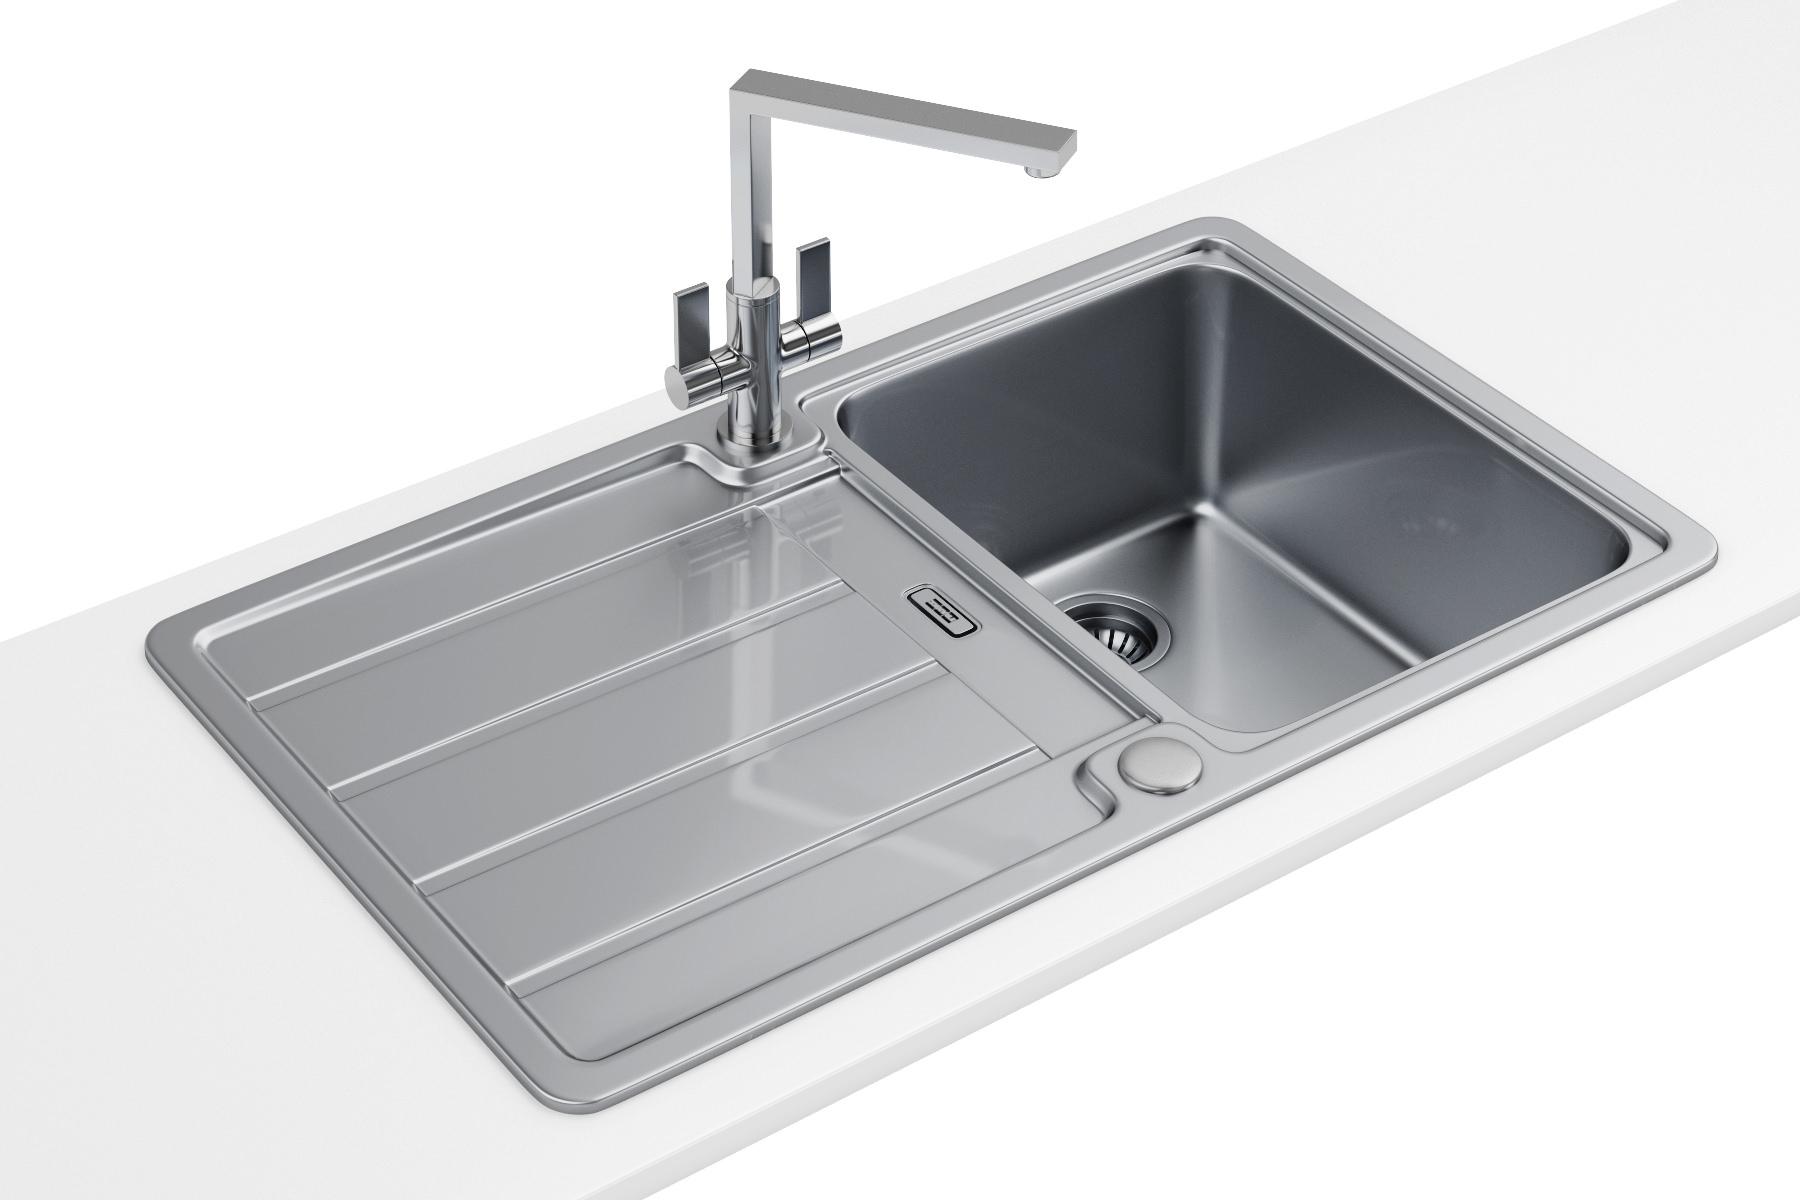 Franke Hydros Hdx 614 Stainless Steel 1 0 Bowl Kitchen